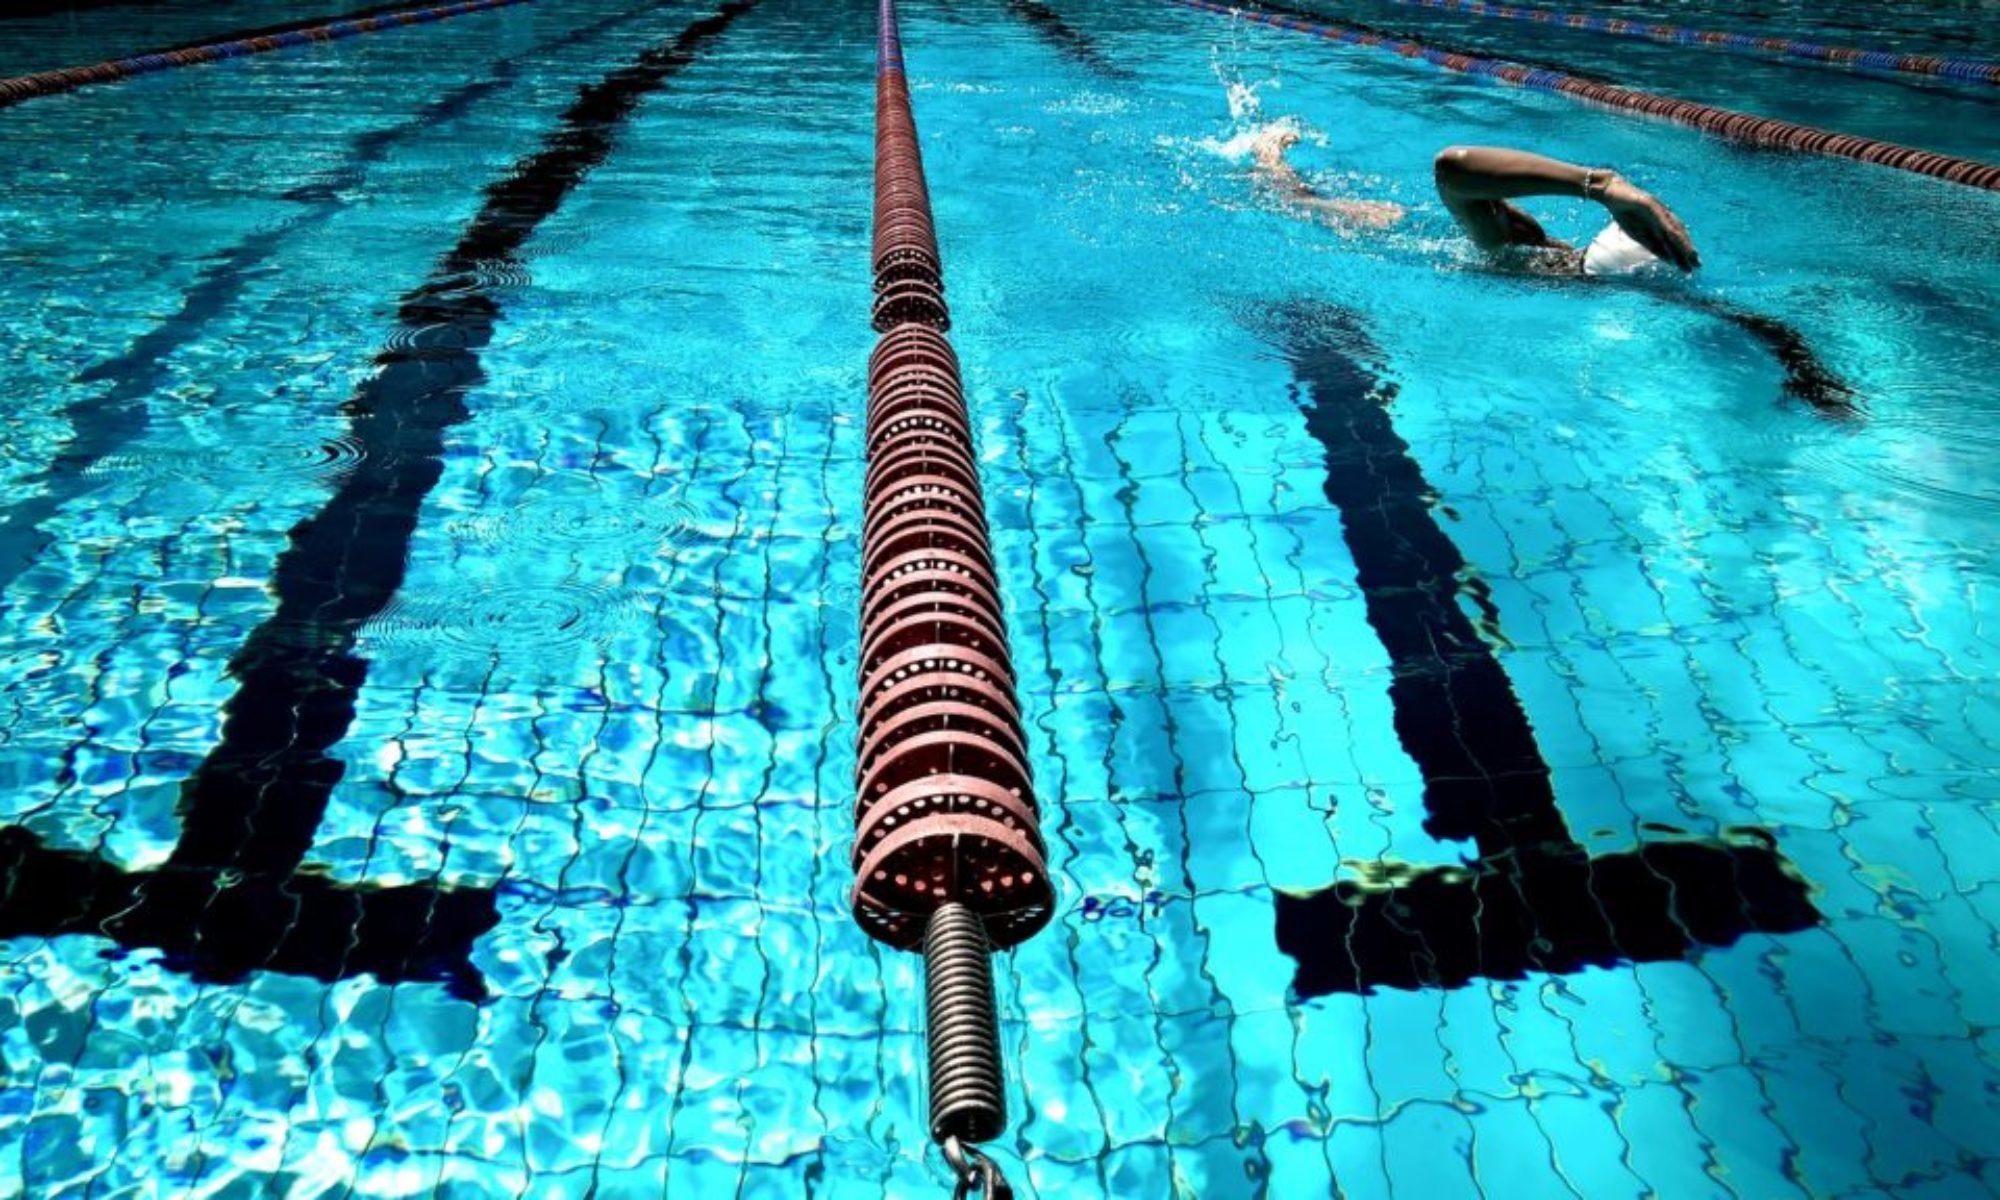 Okotoks Masters Swim Club (OMSC)